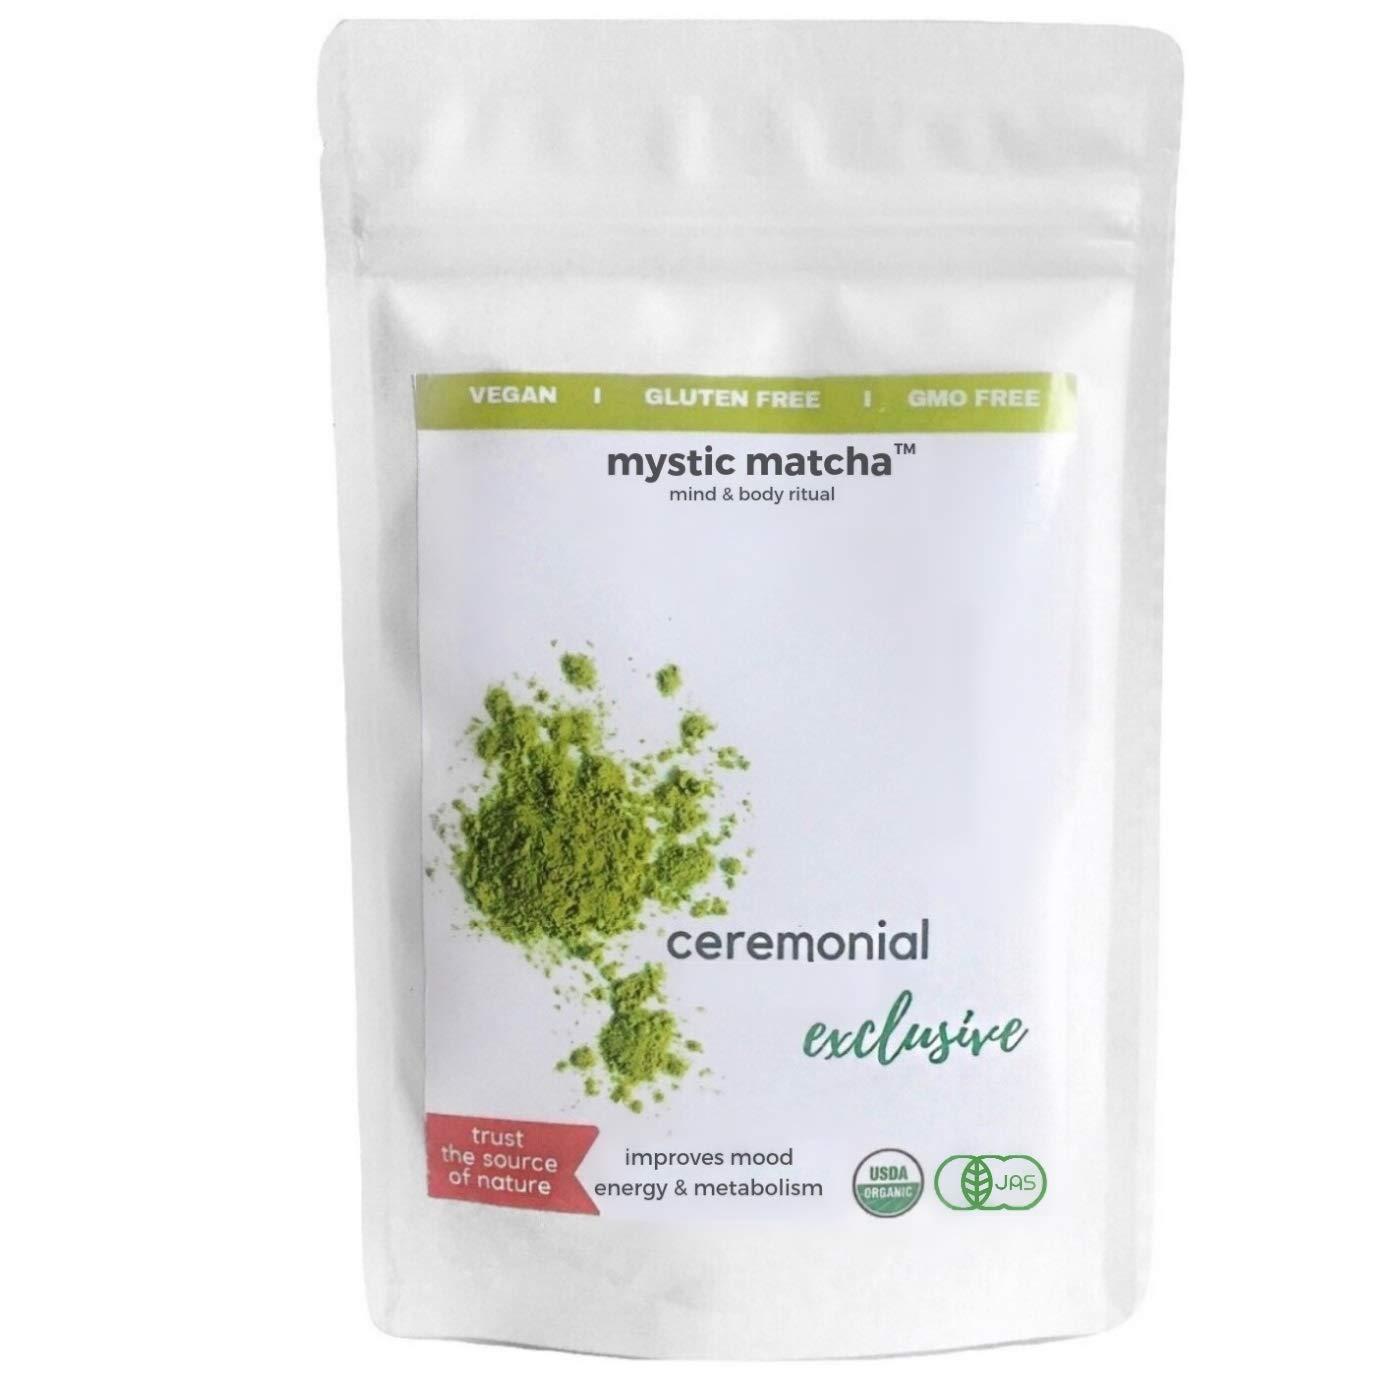 ORGANIC JAPANESE MATCHA - 100g - Green Tea Powder Exclusive Ceremonial by MysticMatcha™